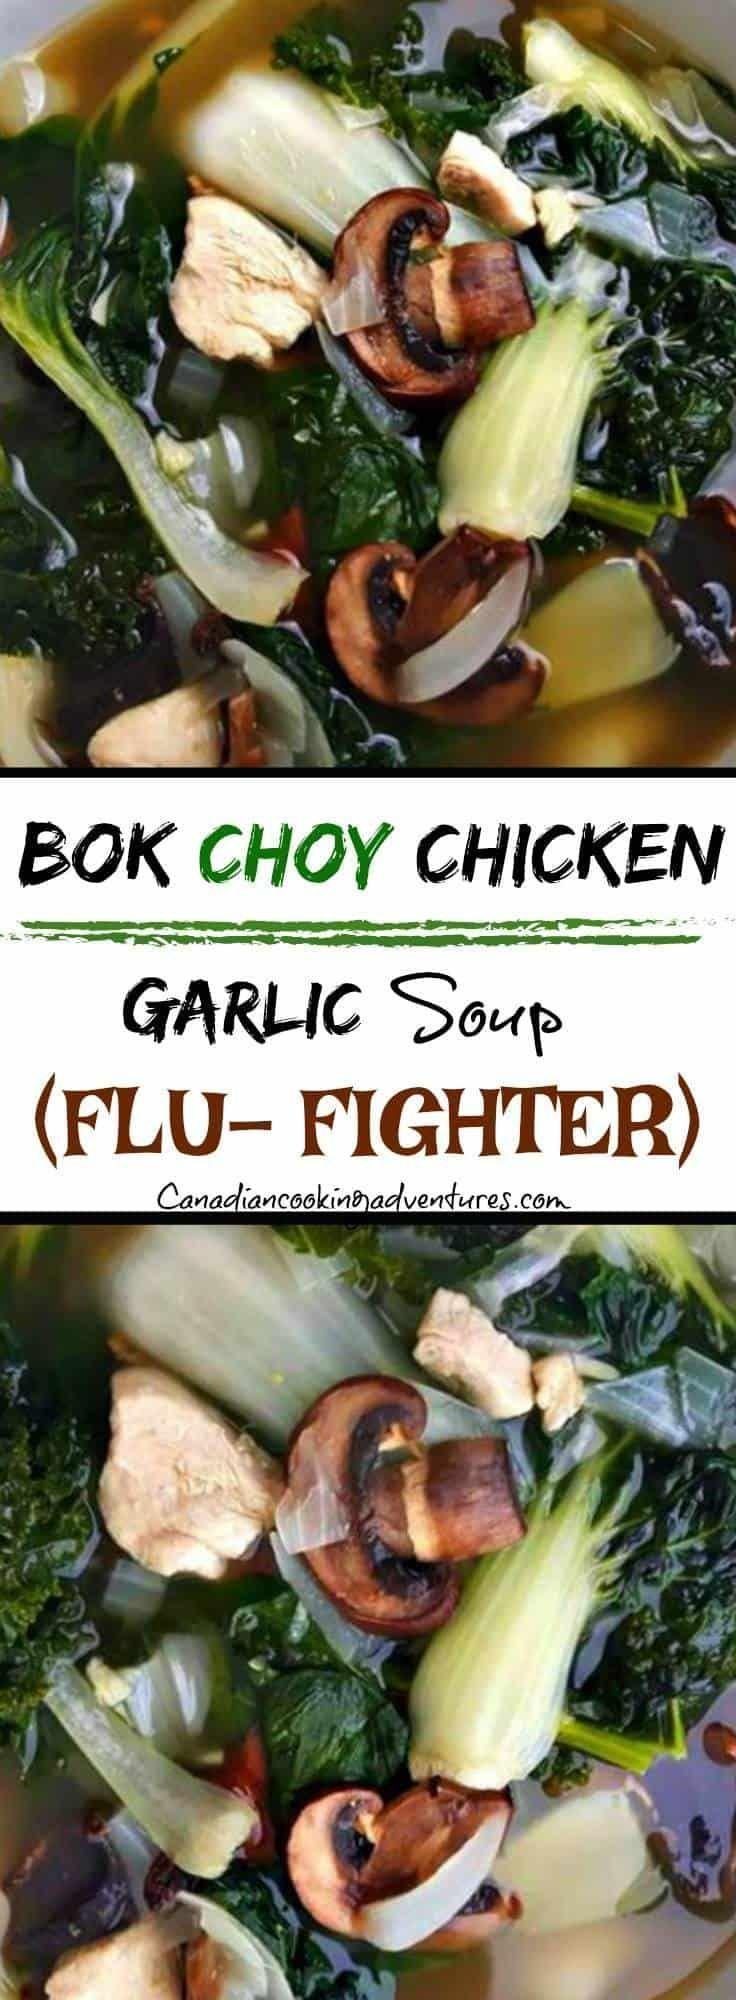 Bok Choy Chicken Garlic Soup (Flu-Fighter) #recettesympa